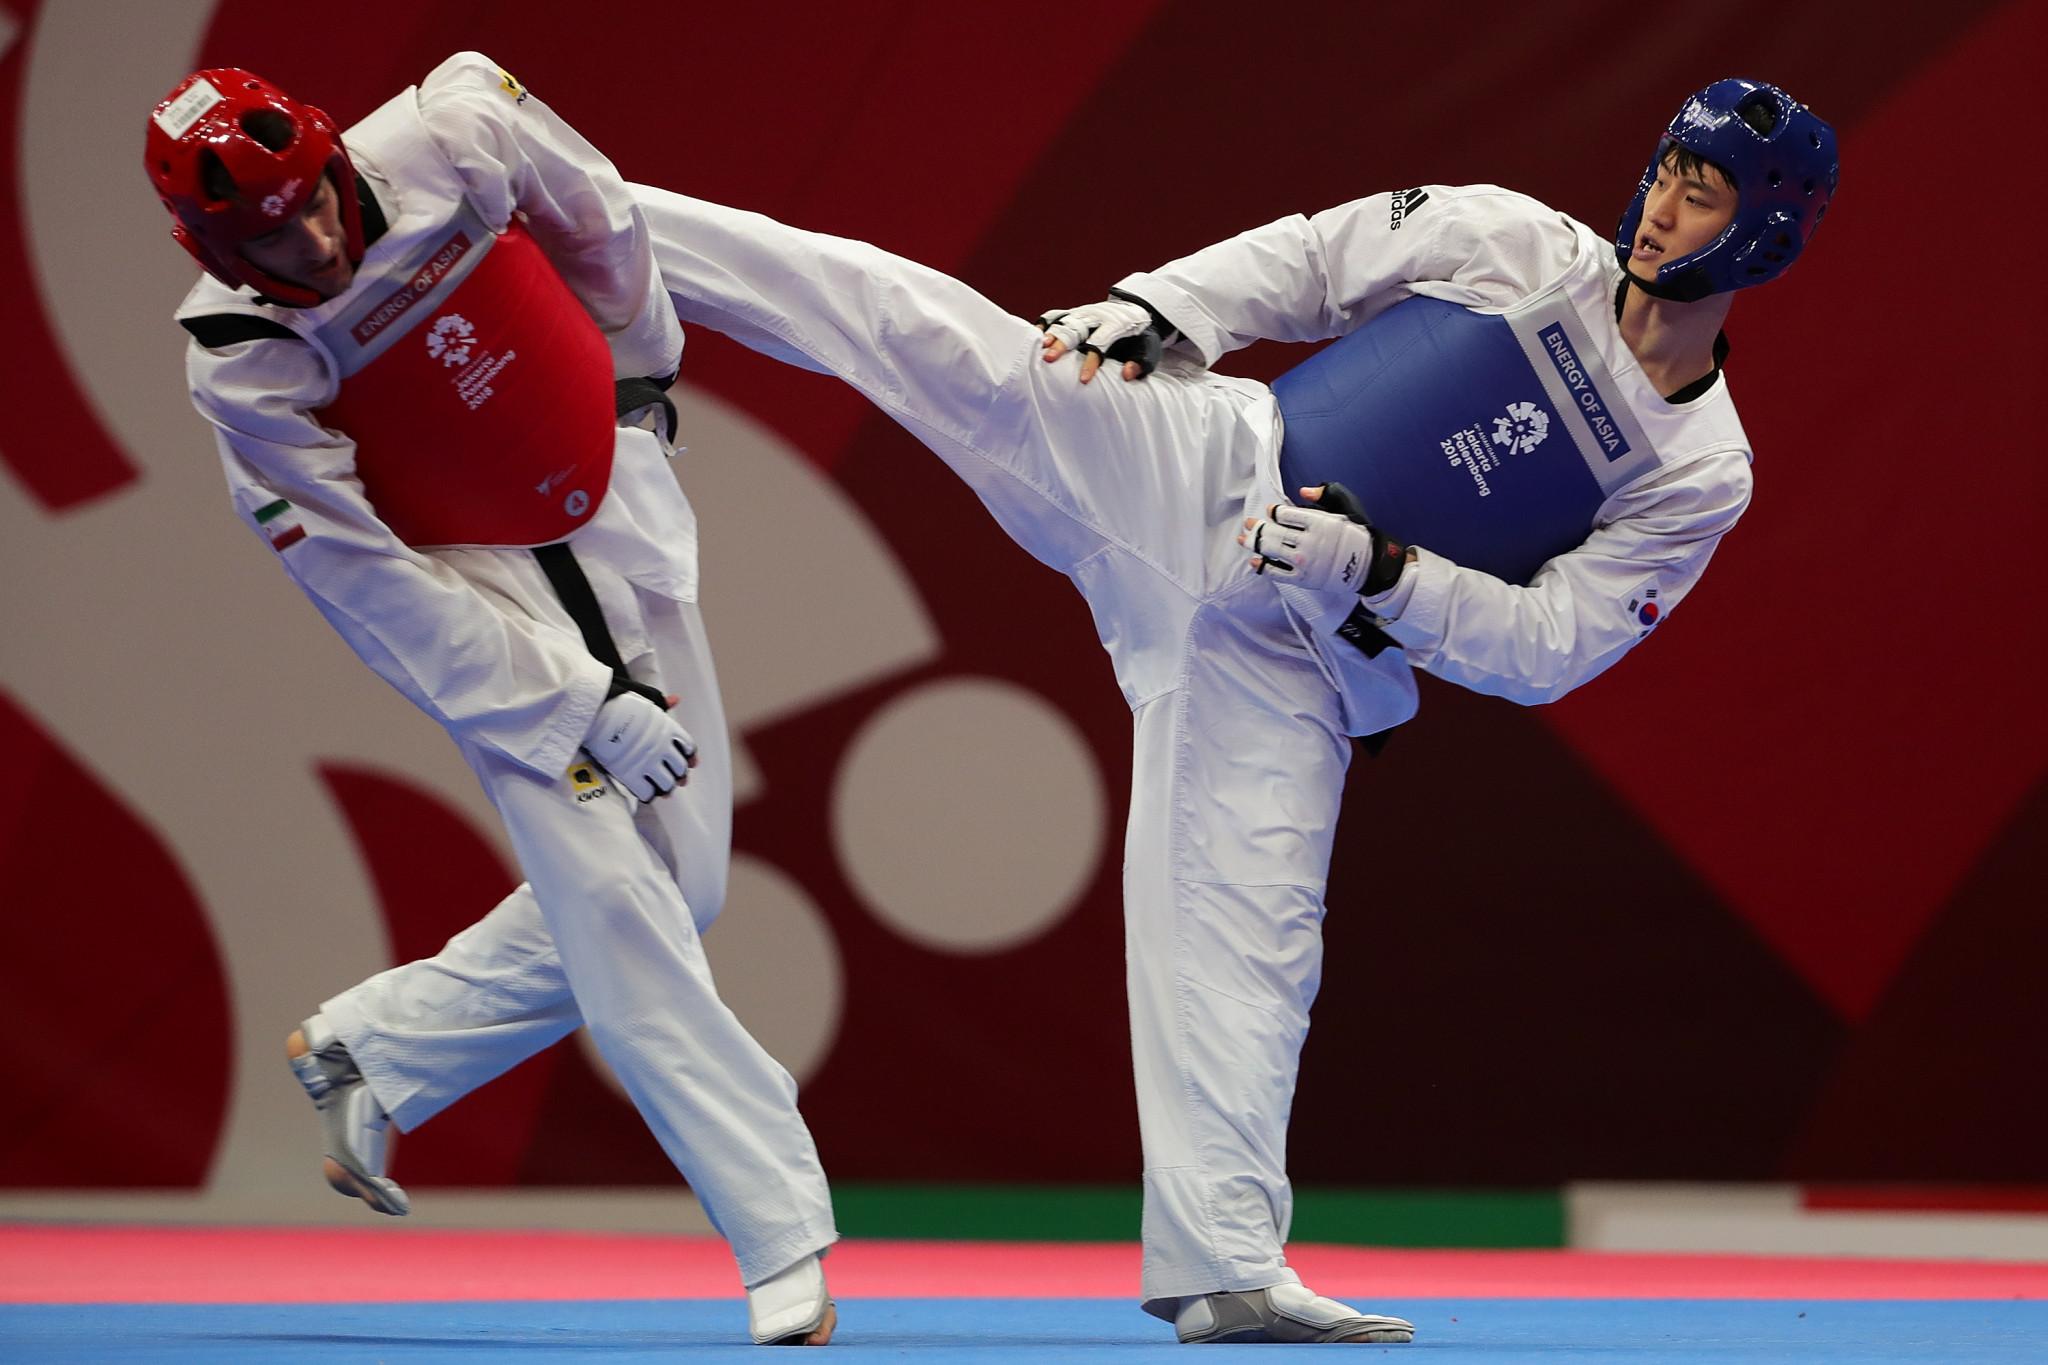 South Korea's Lee among winners on day one of World Taekwondo Grand Slam Champions Series